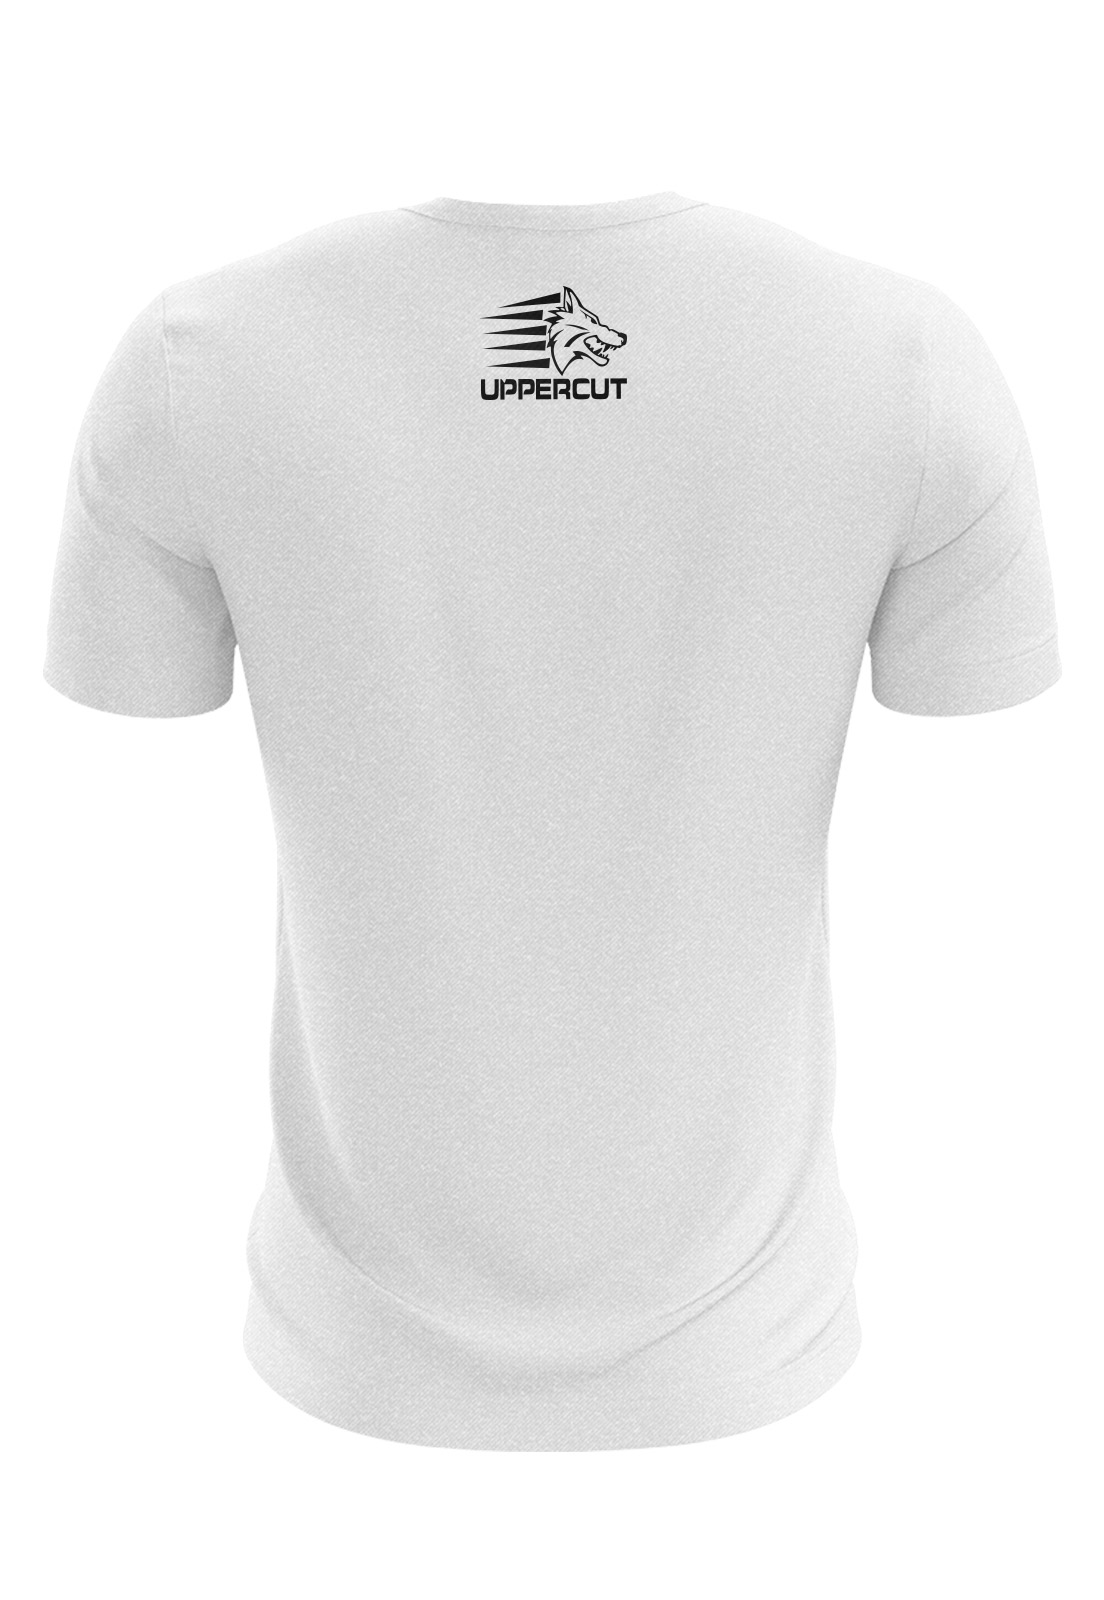 Kit 2 Camisas Dry Fit MC - UV50+ - Jiu Jitsu - Kt35